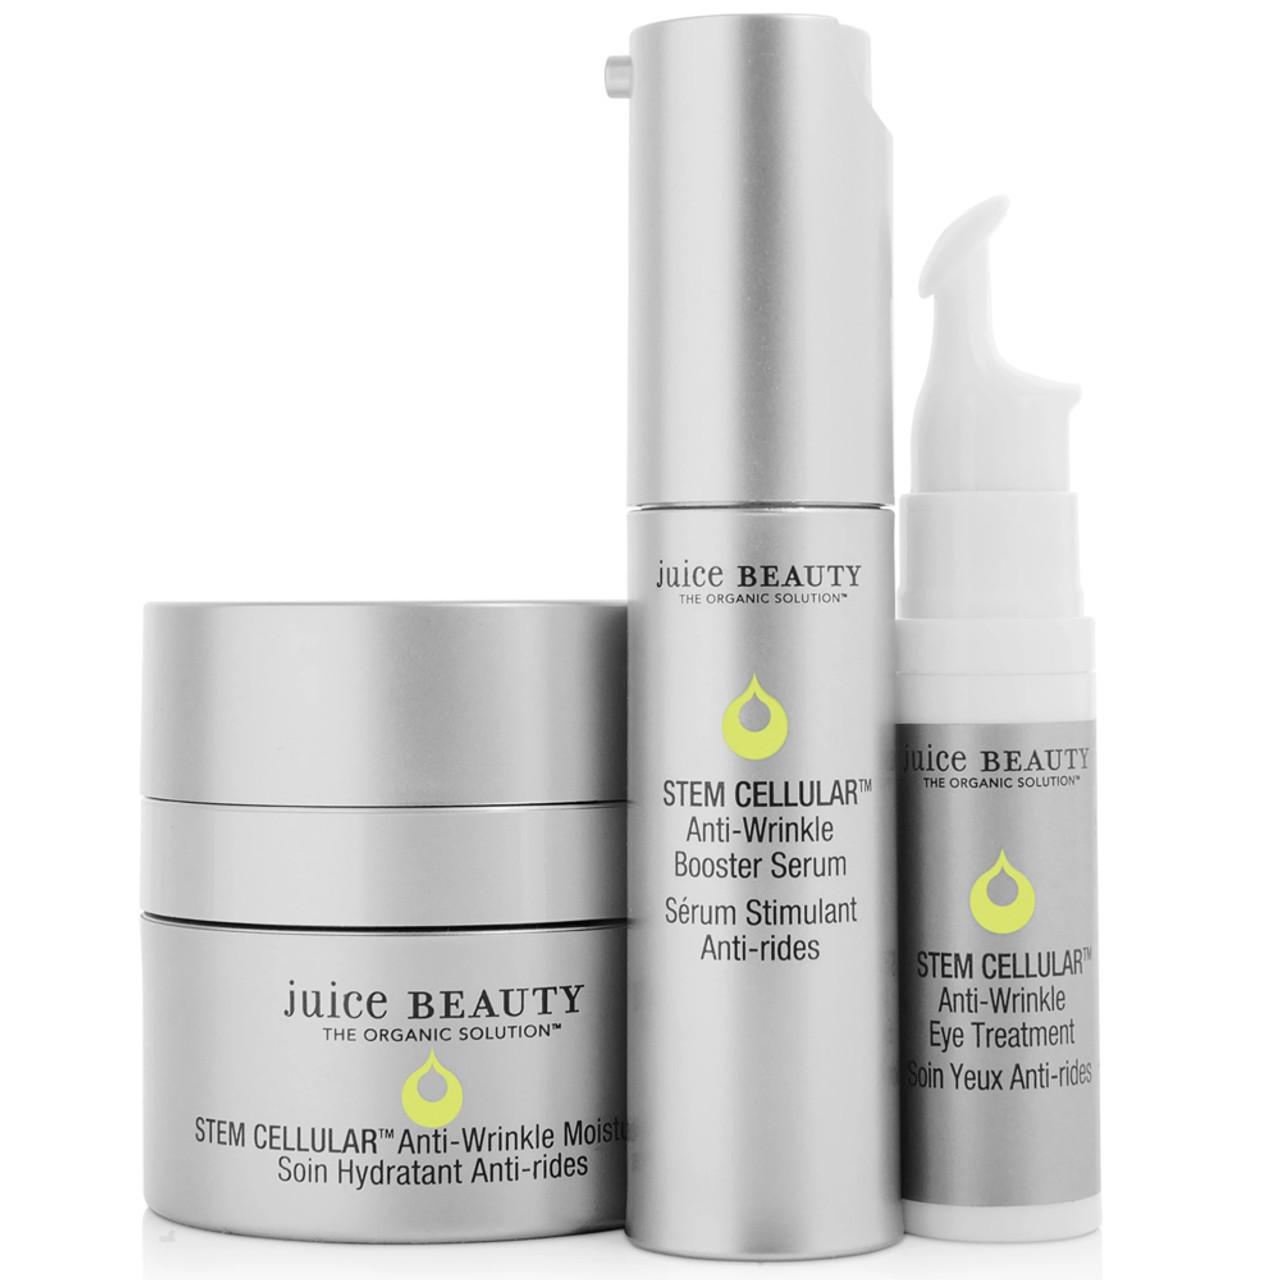 Juice Beauty SC Anti-Wrinkle Solutions Kit